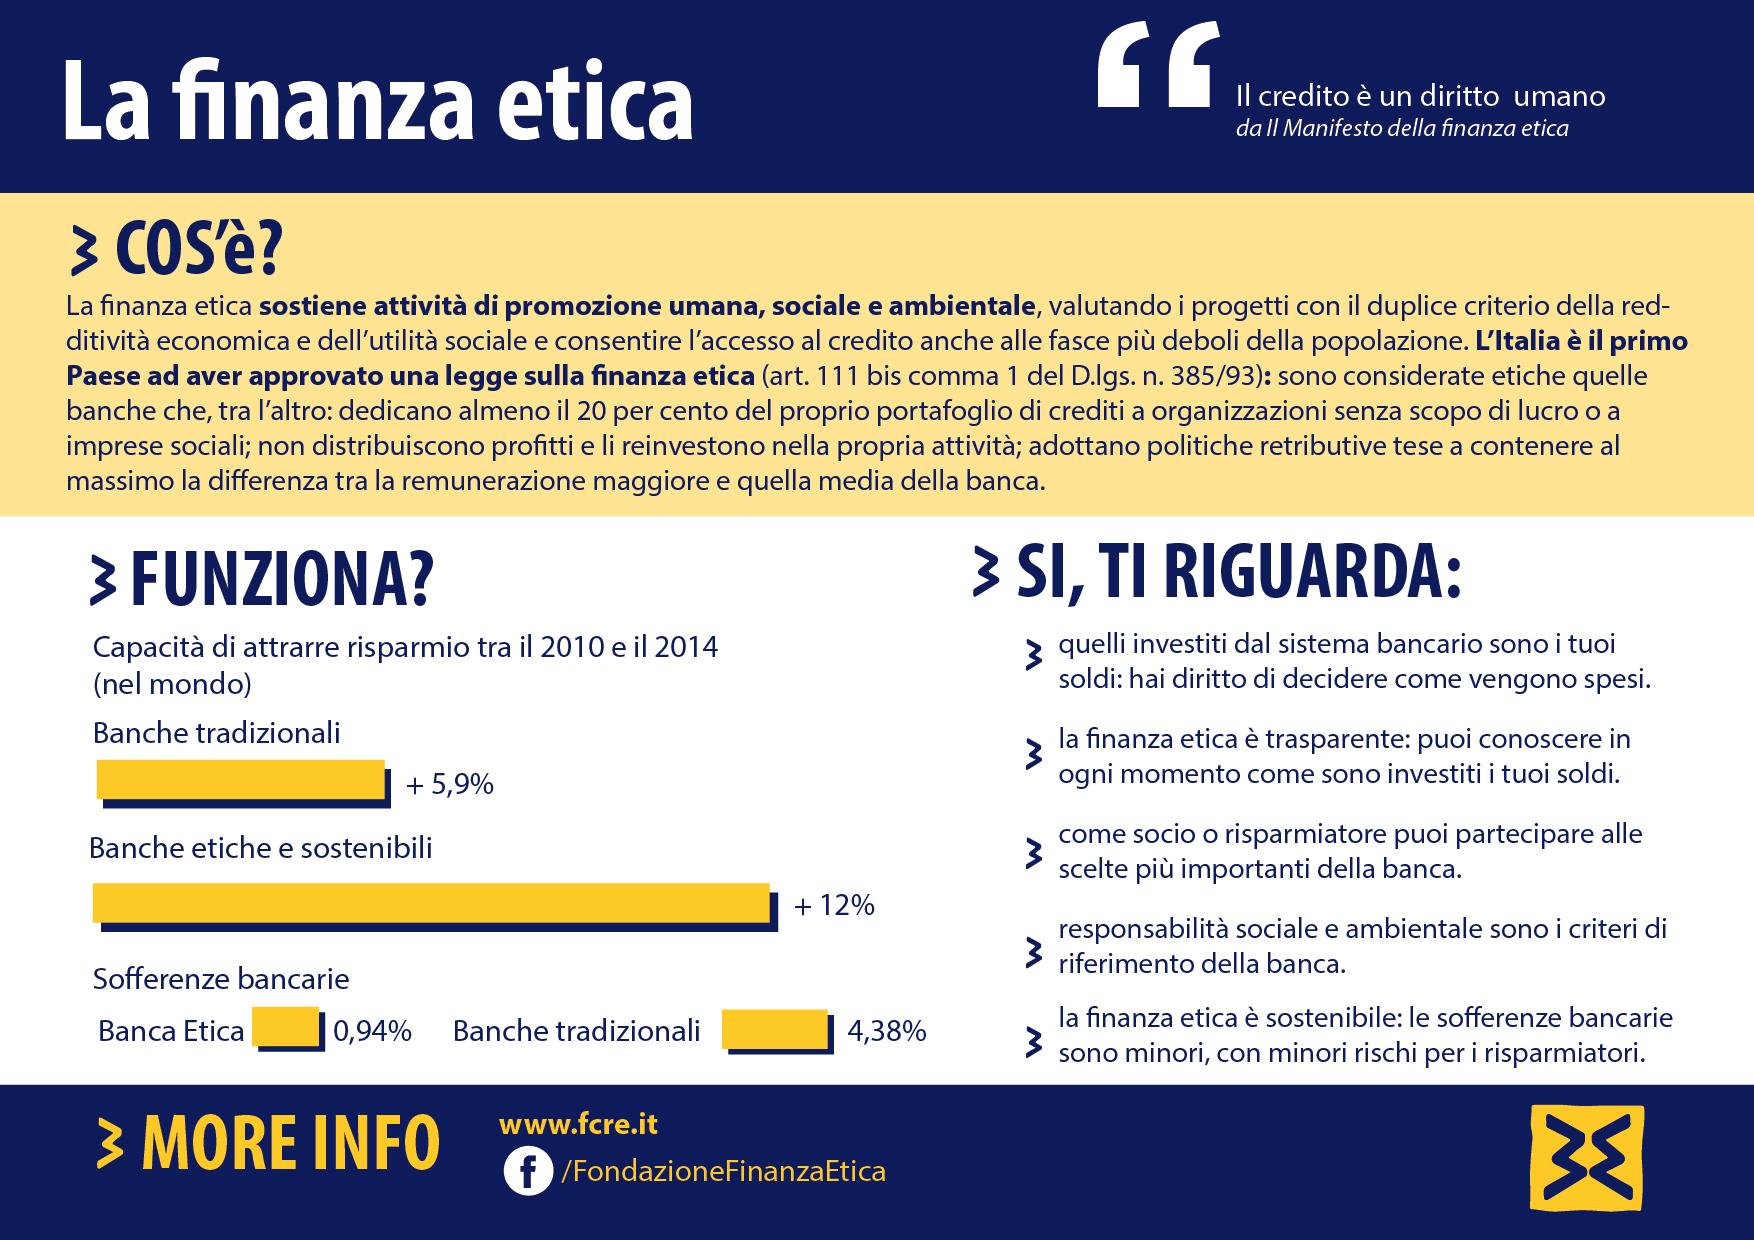 1868970a81 scheda_finanza_etica-01.jpg